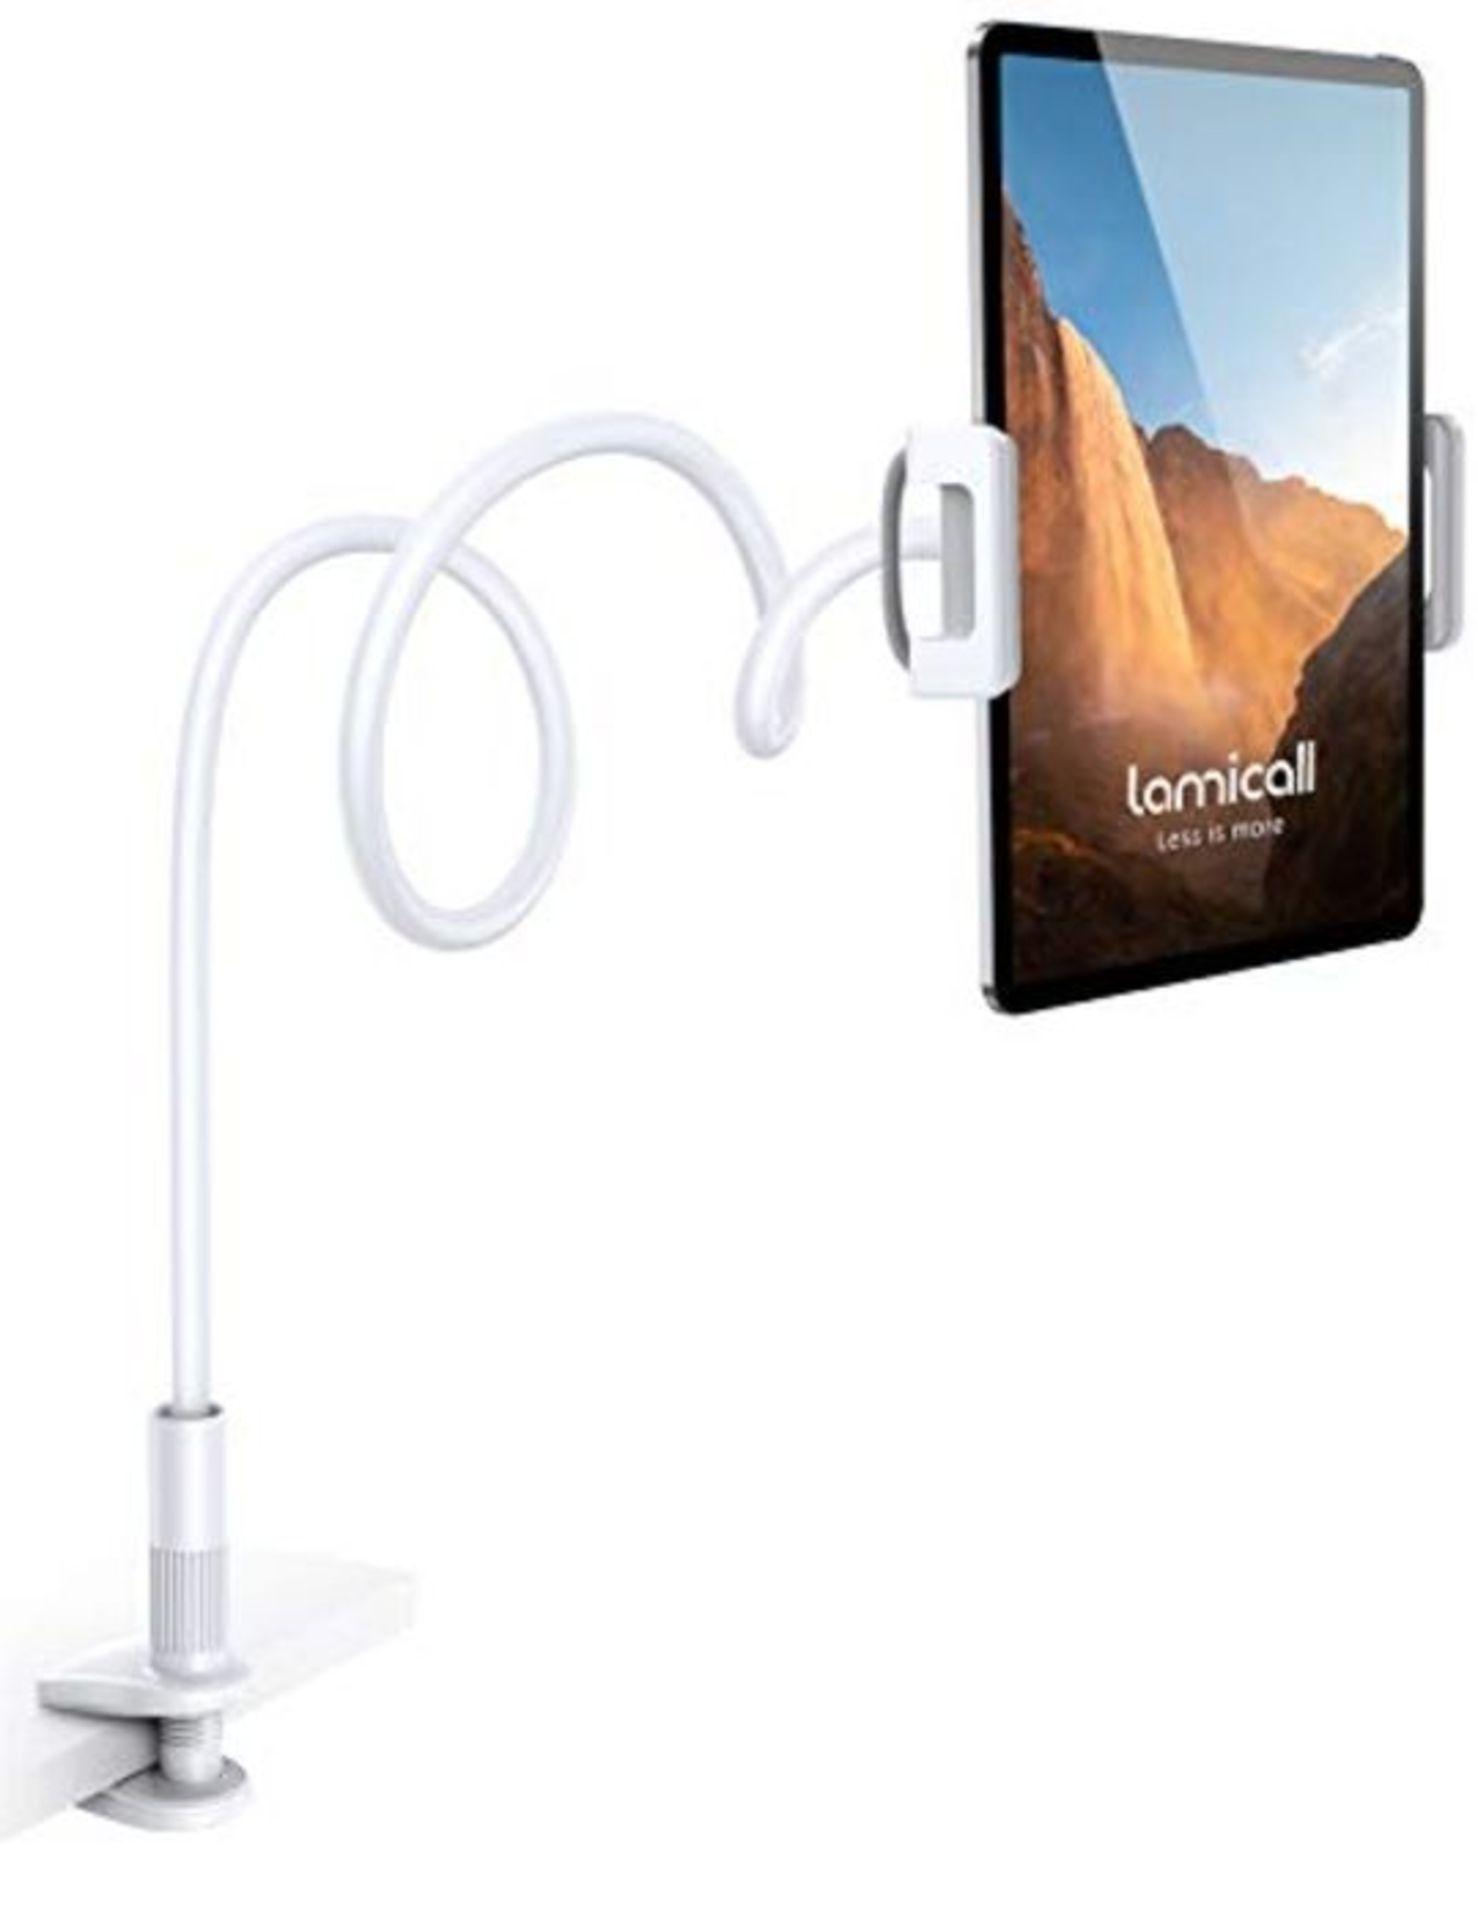 Lamicall Gooseneck Tablet Holder, Flexible Tablet Stand - 360 Adjustable Lazy Arm Hold